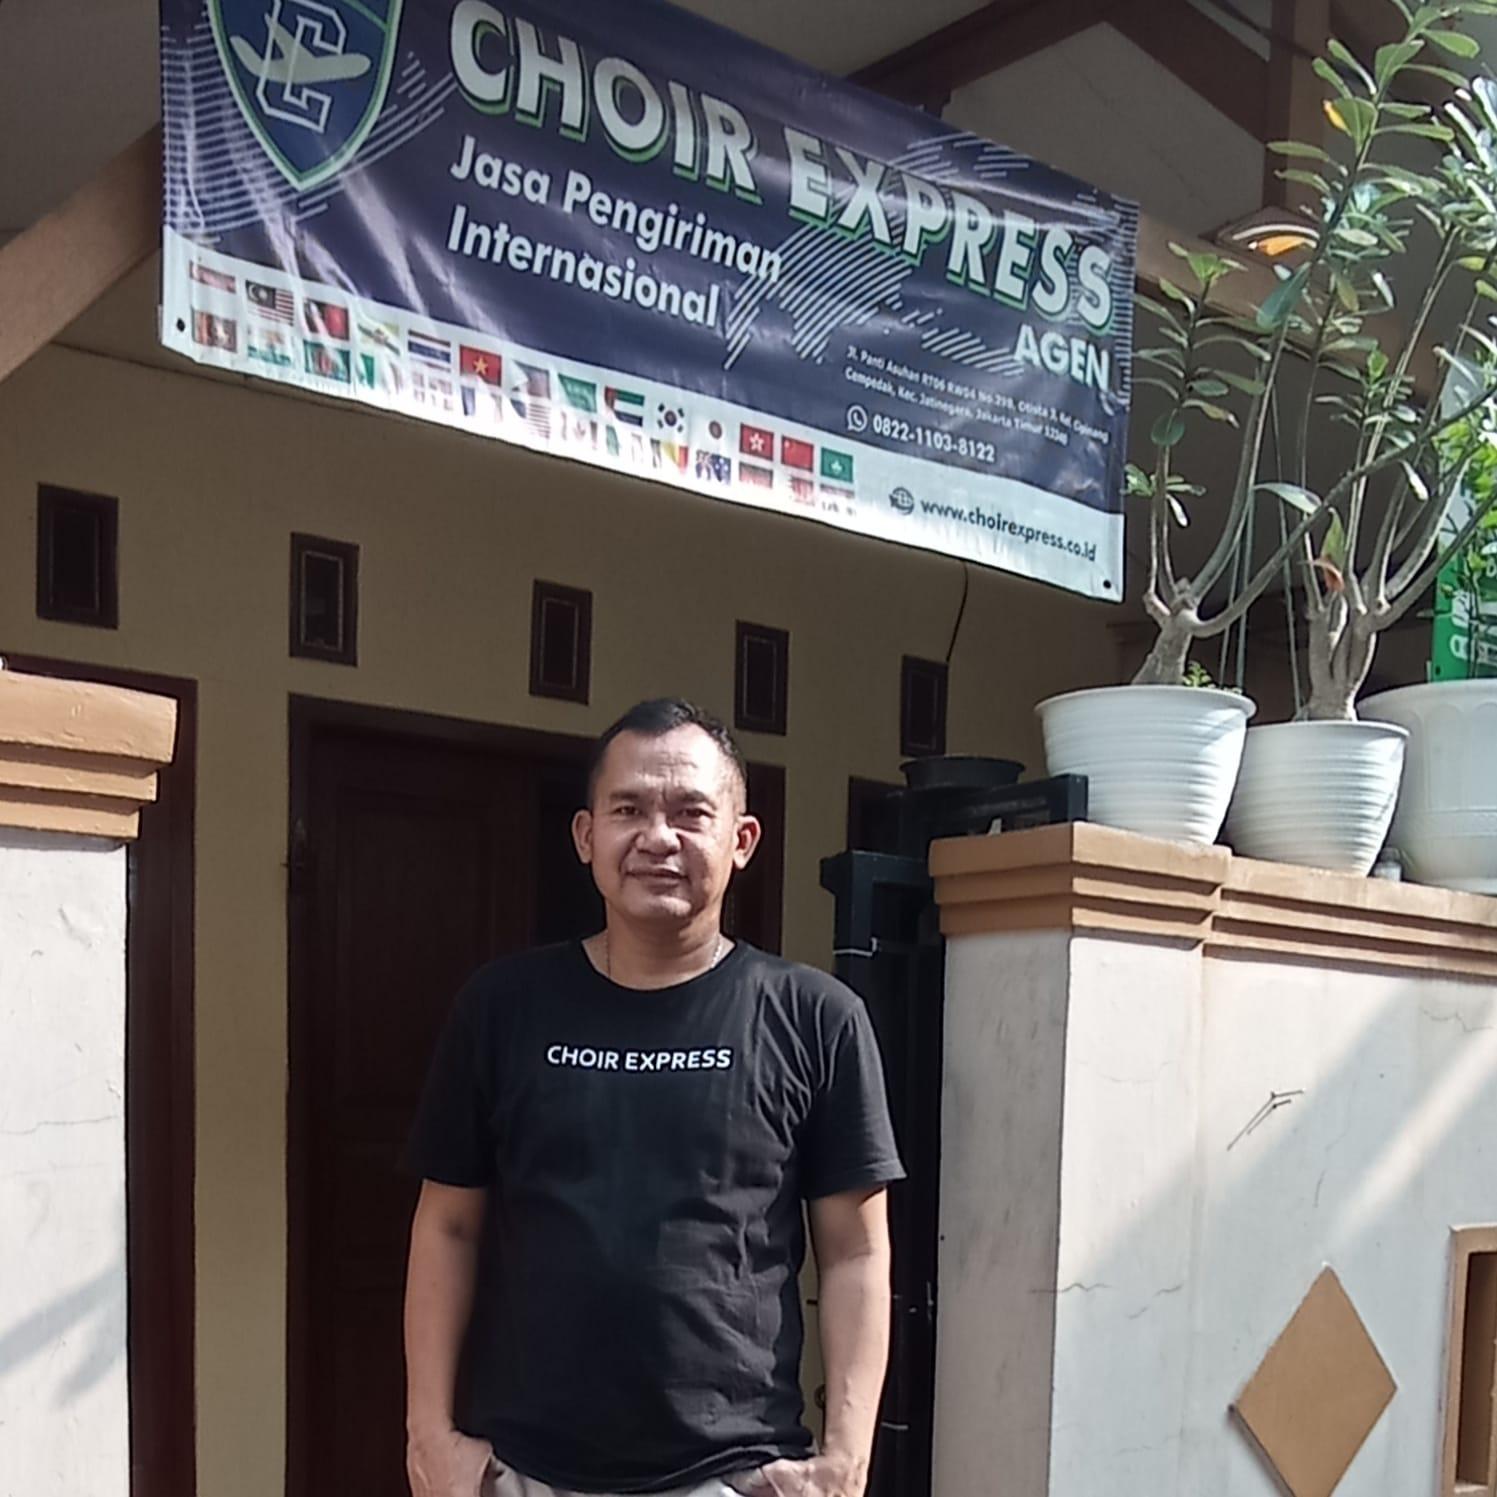 Dari Pekerja Tambang, Ahmad Jayadi Alih Profesi jadi Pengusaha Expedisi Choir Express Agen Otista